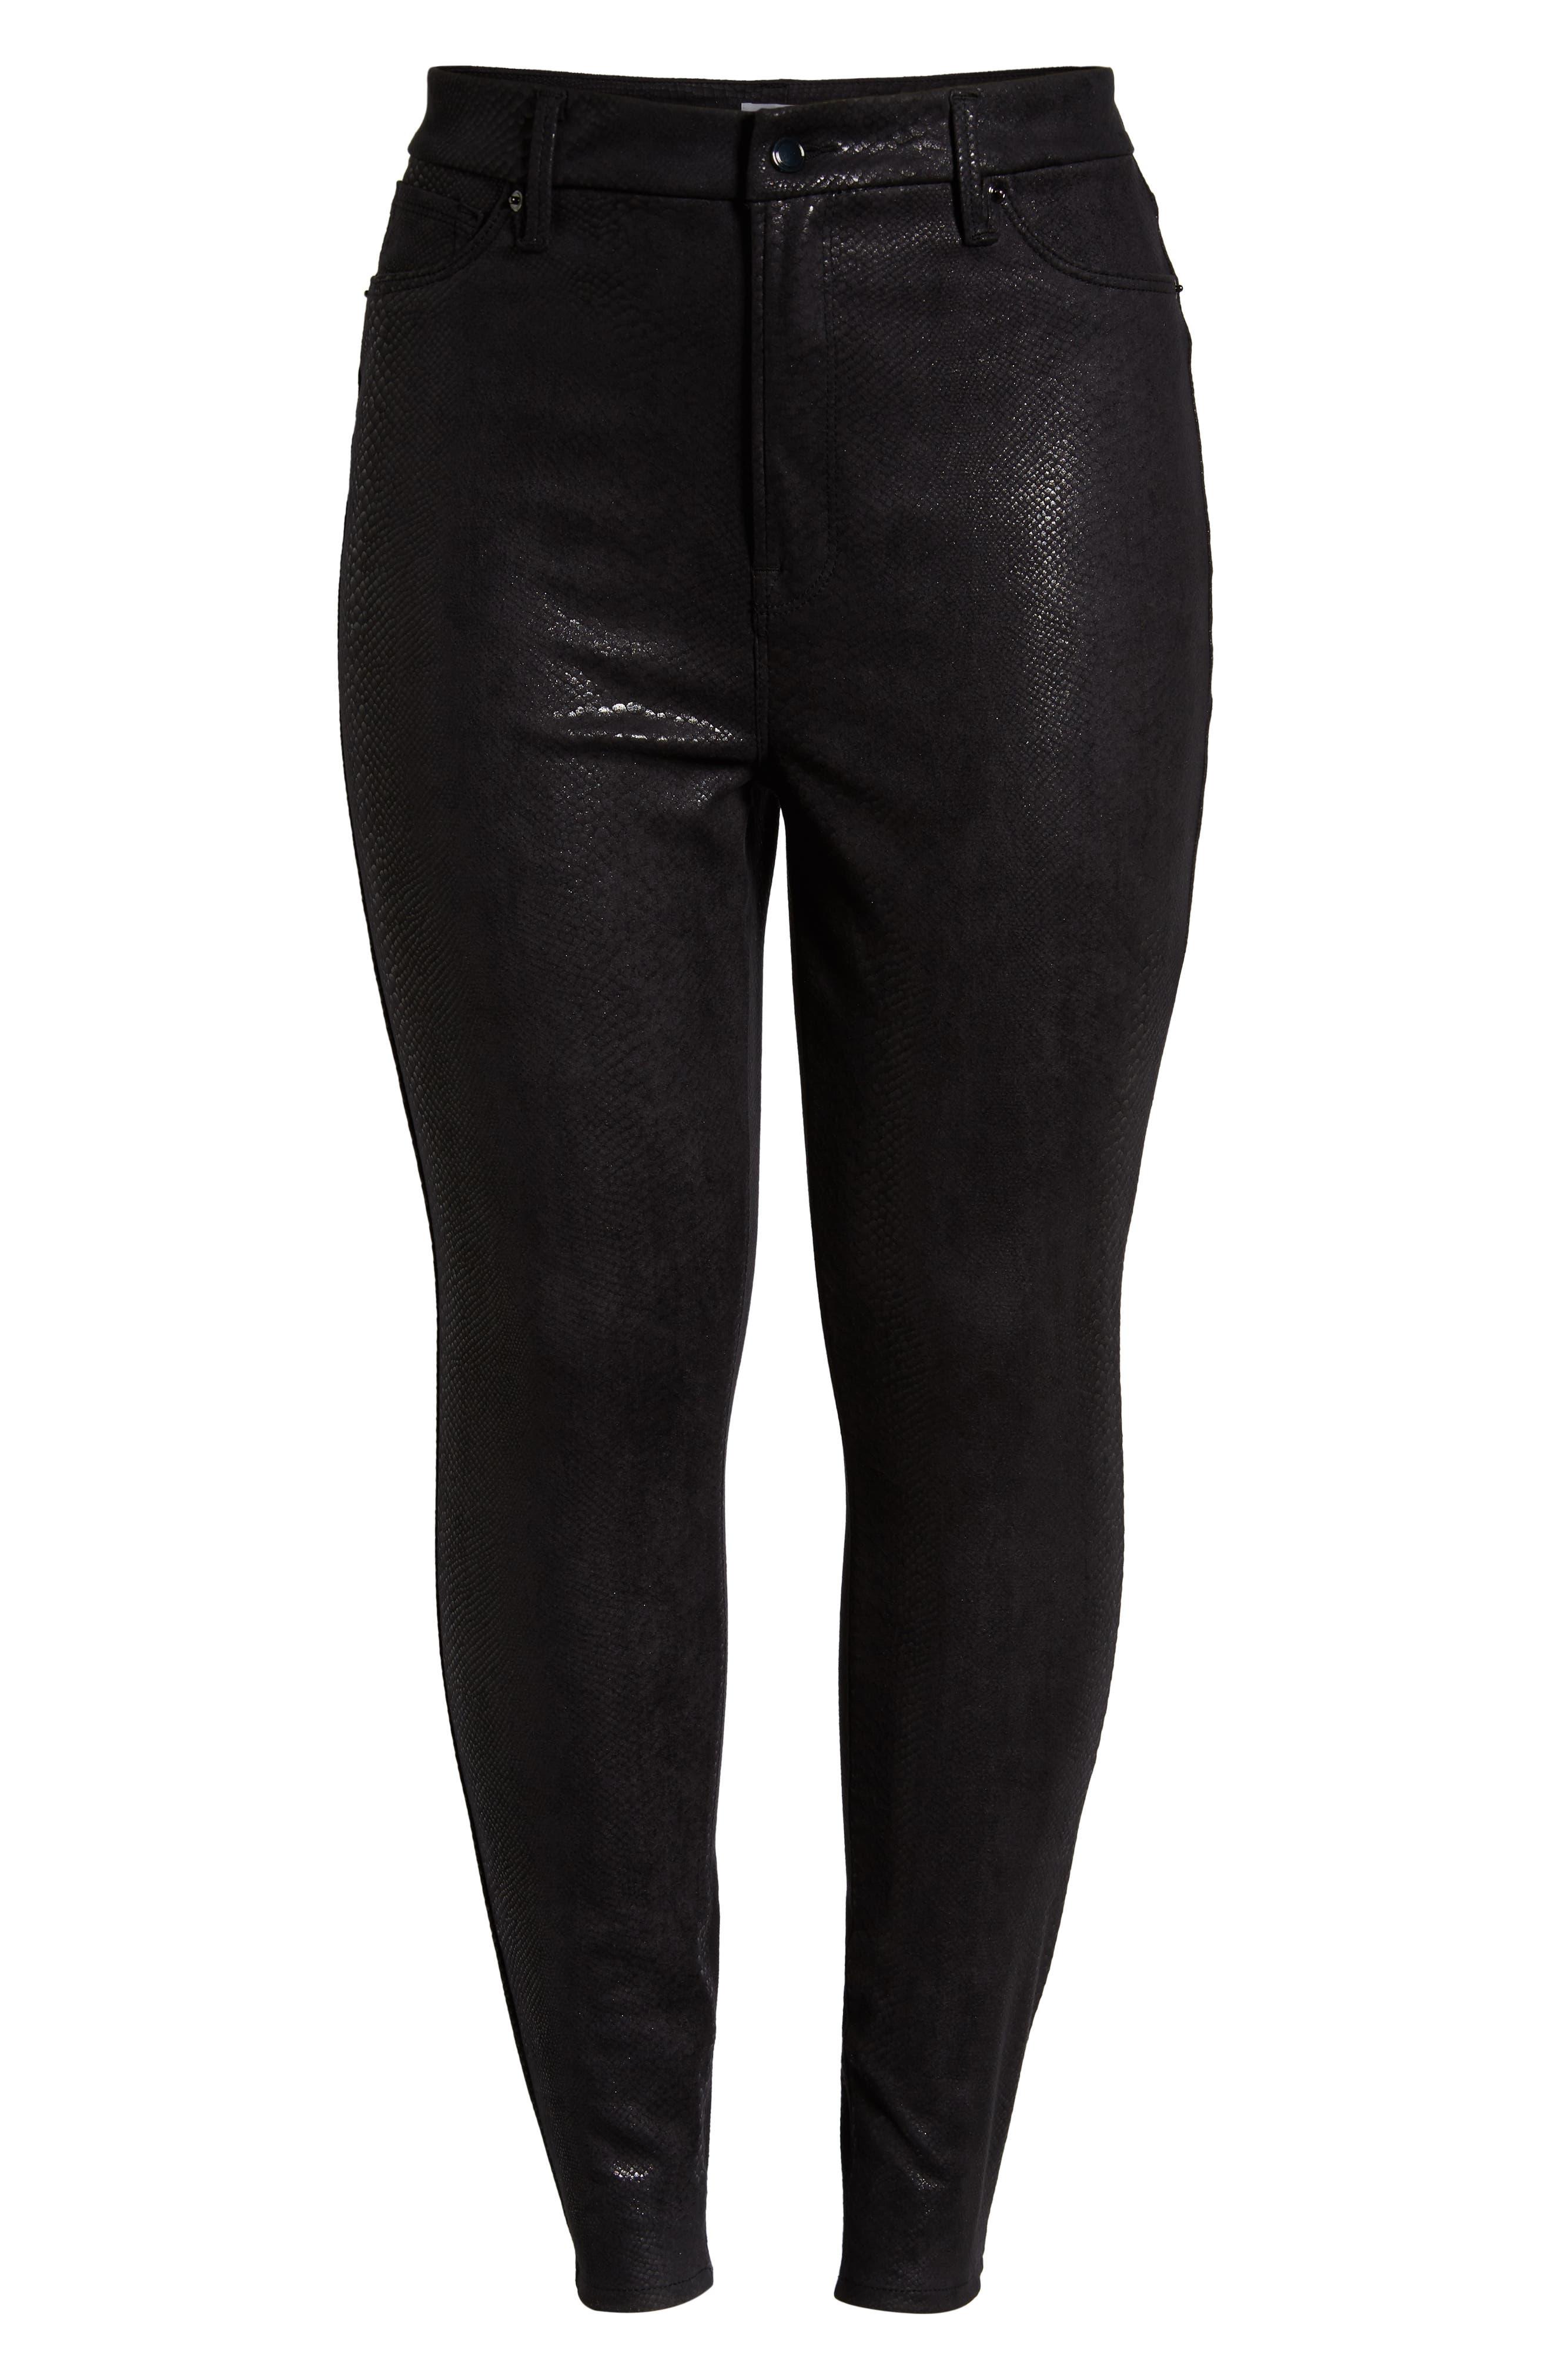 GOOD AMERICAN,                             Good Legs Metallic Snake Print Skinny Jeans,                             Alternate thumbnail 6, color,                             BLACK041